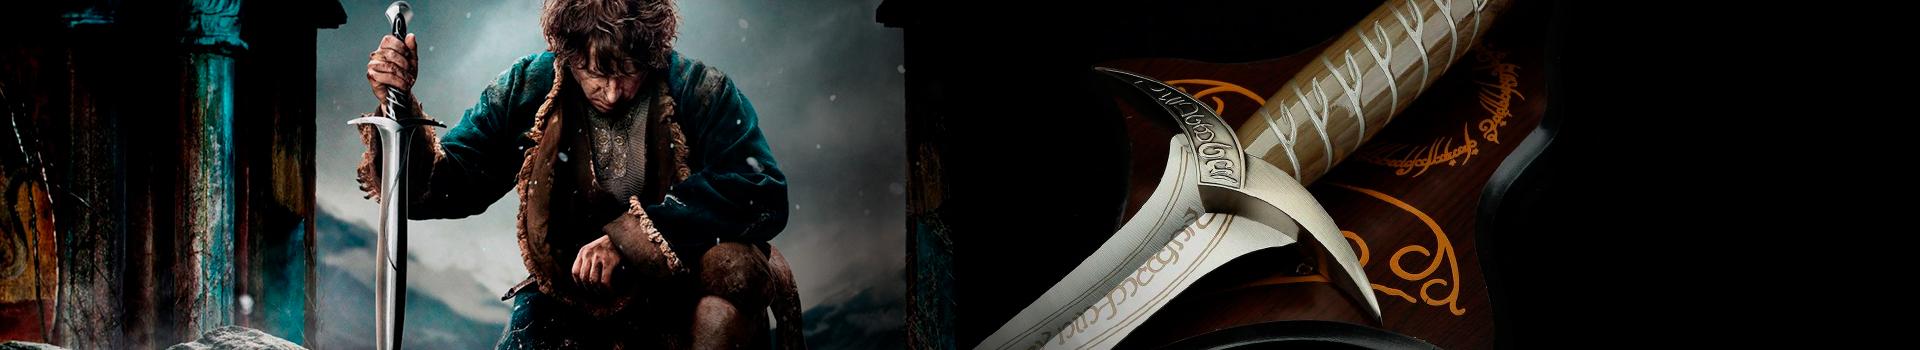 Banner Interno Halloween Espadas